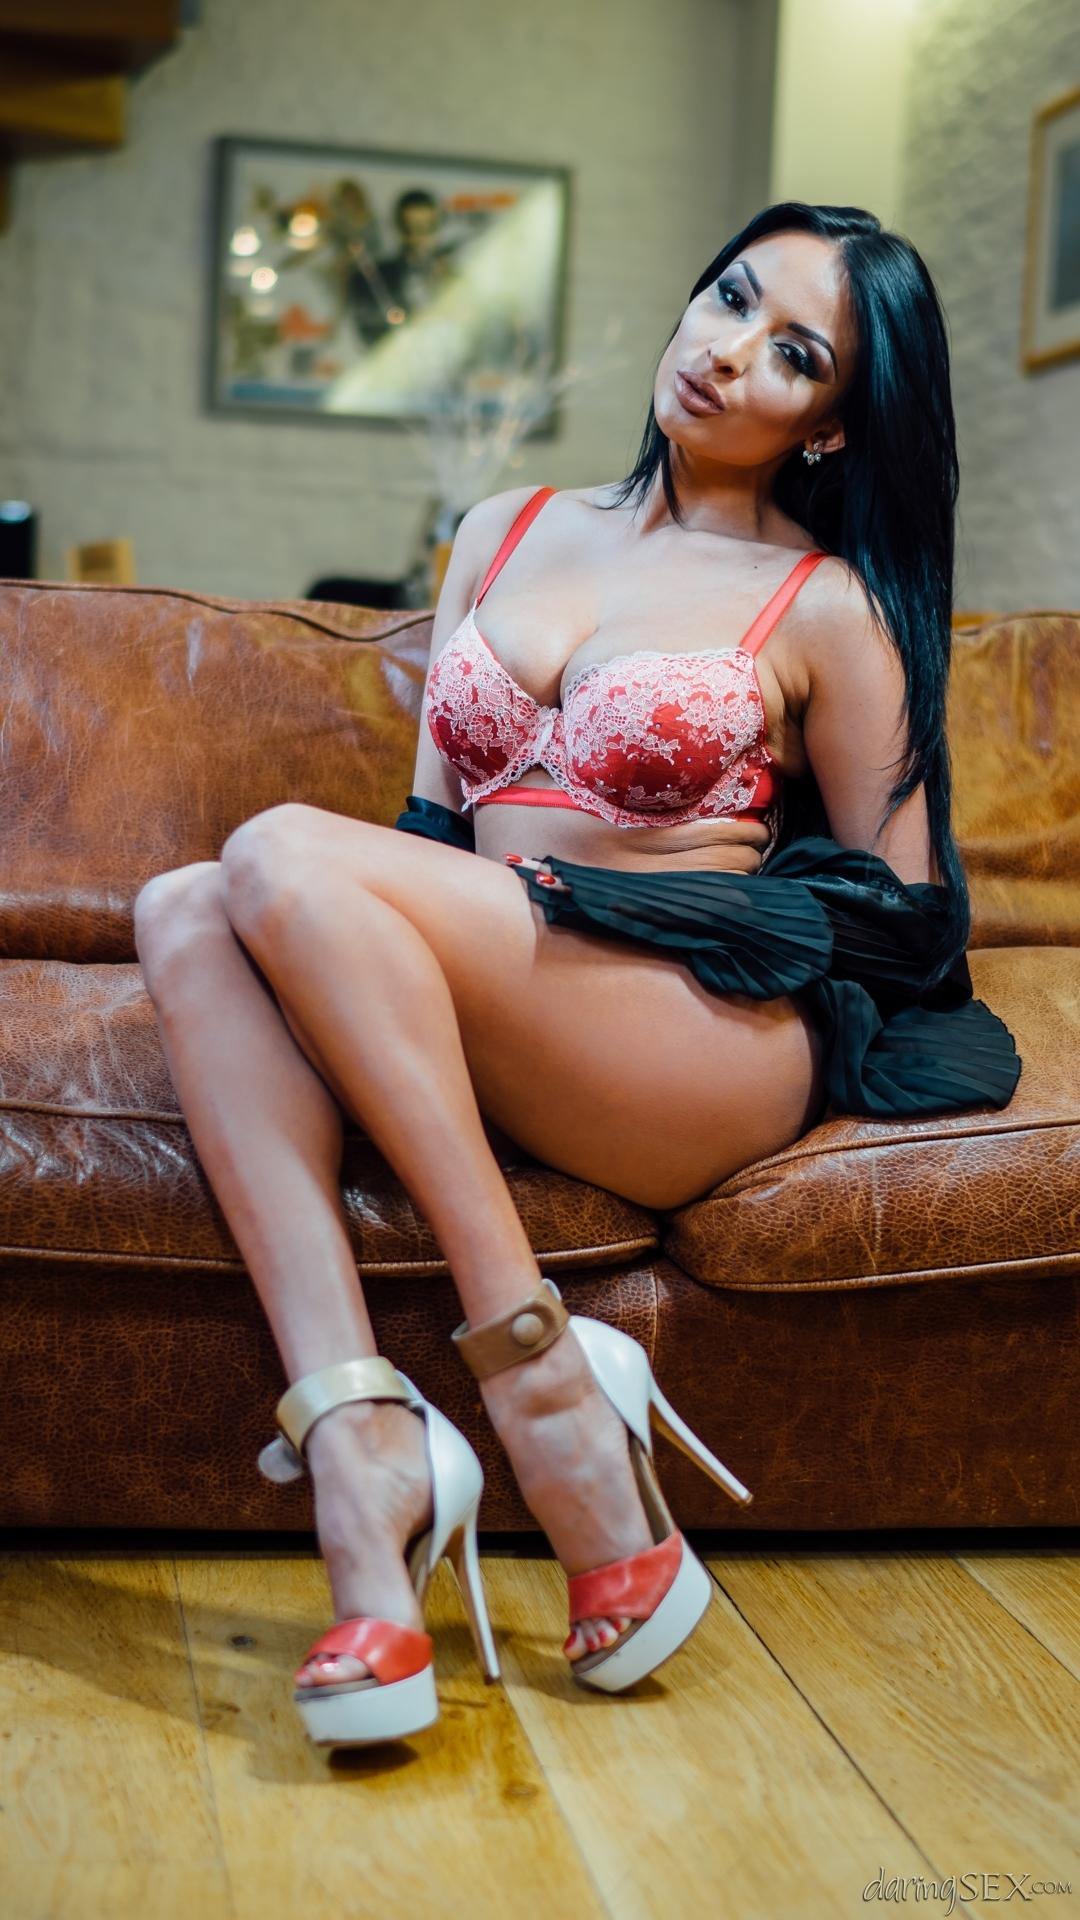 PHOTO | 00 67 - Busty Anissa Kate Riding a Big Dick